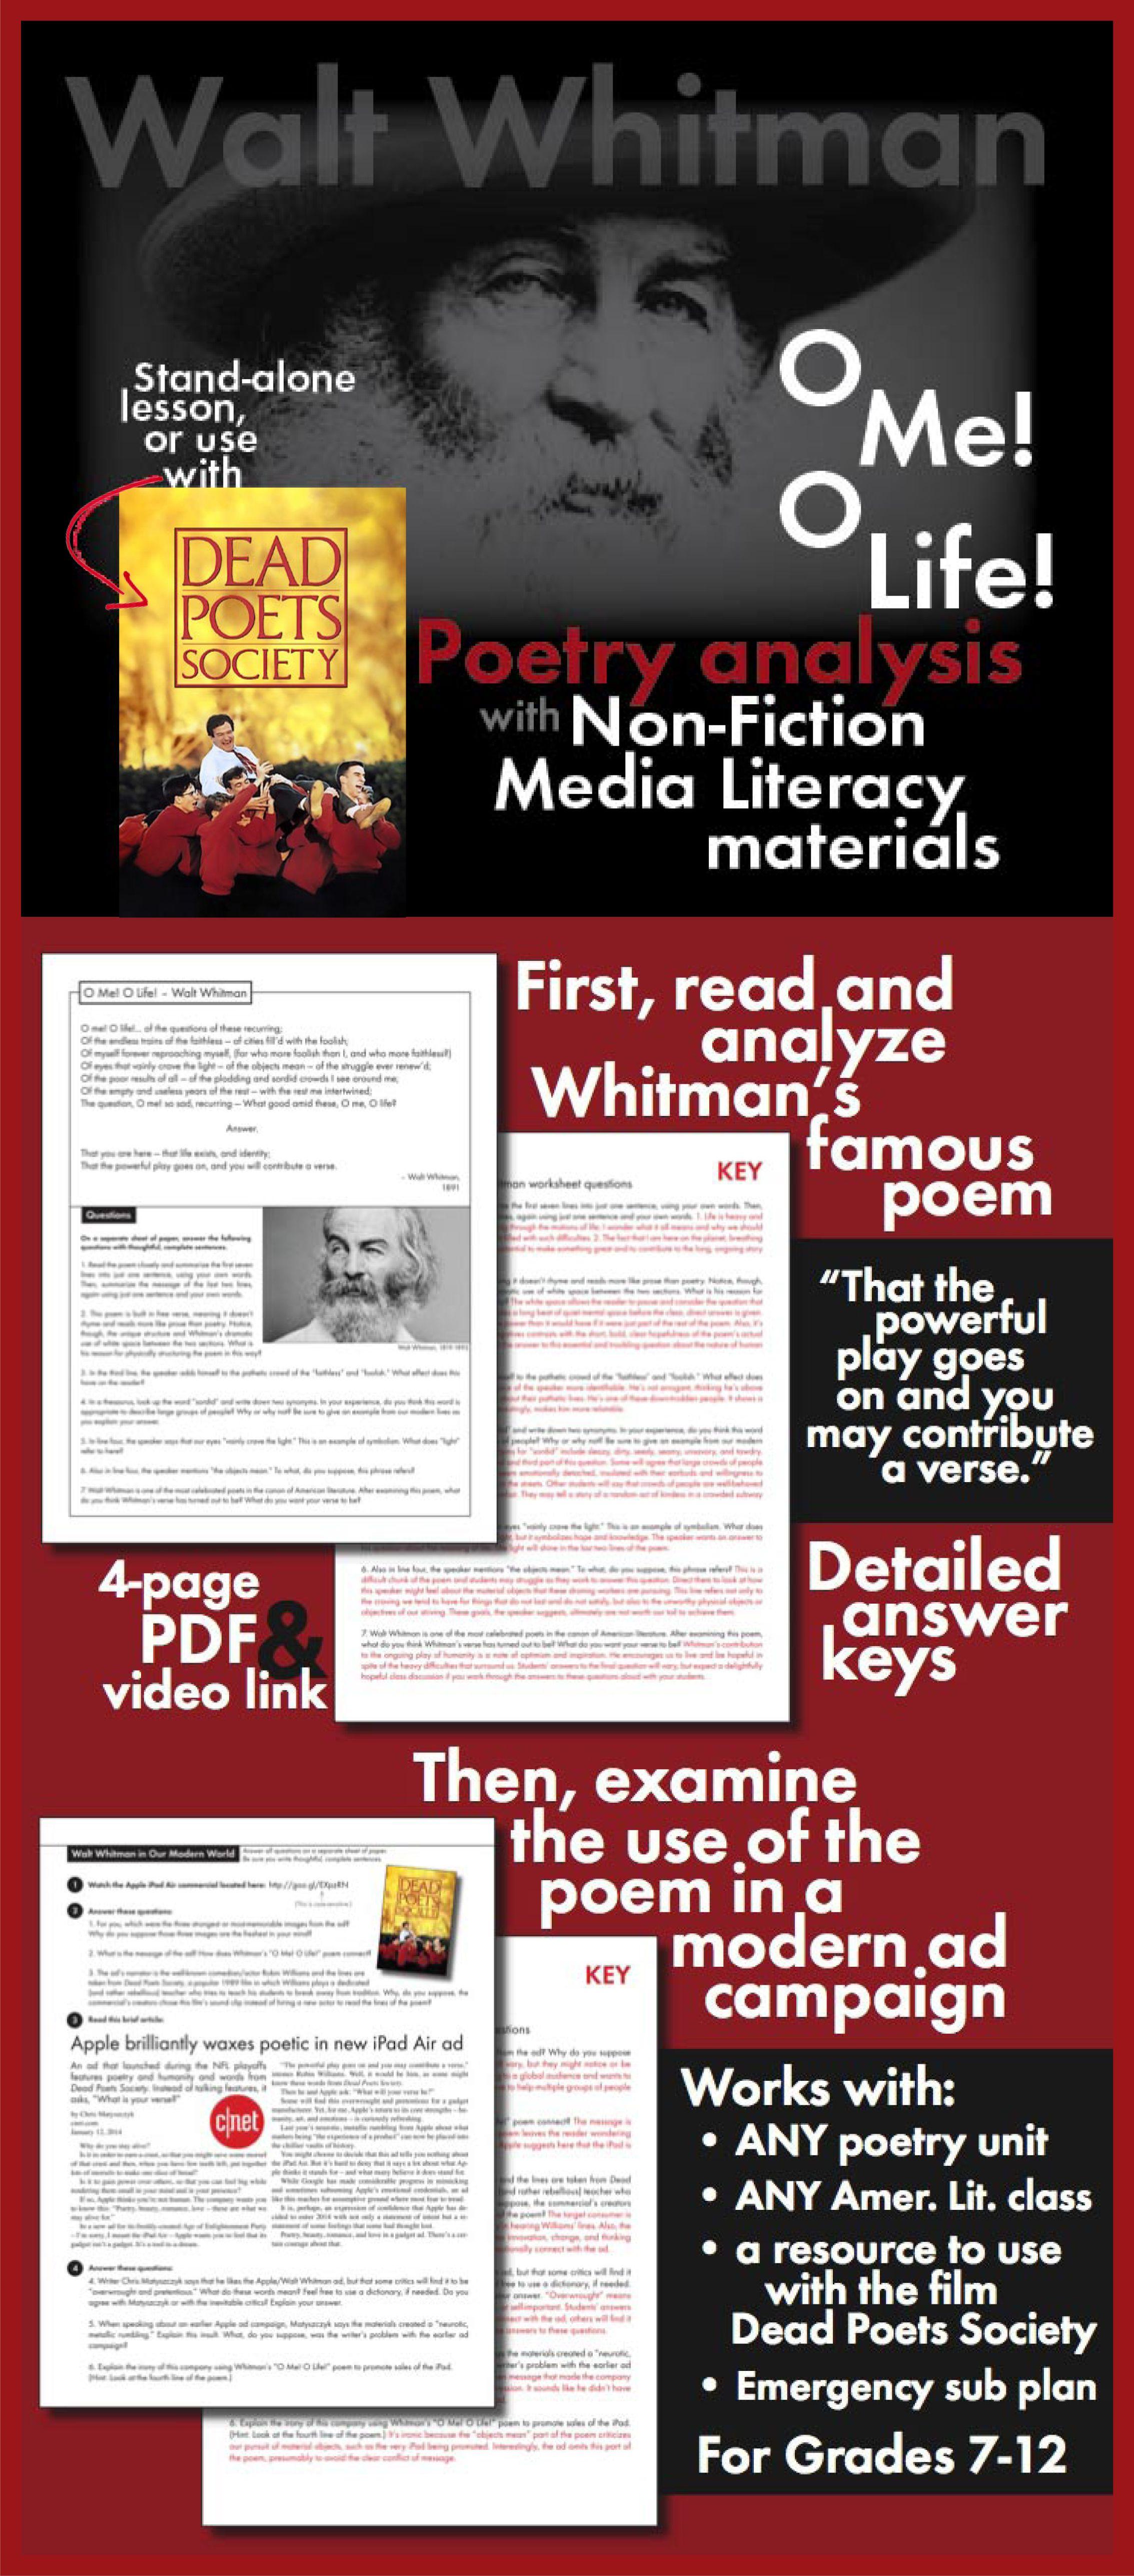 america walt whitman analysis